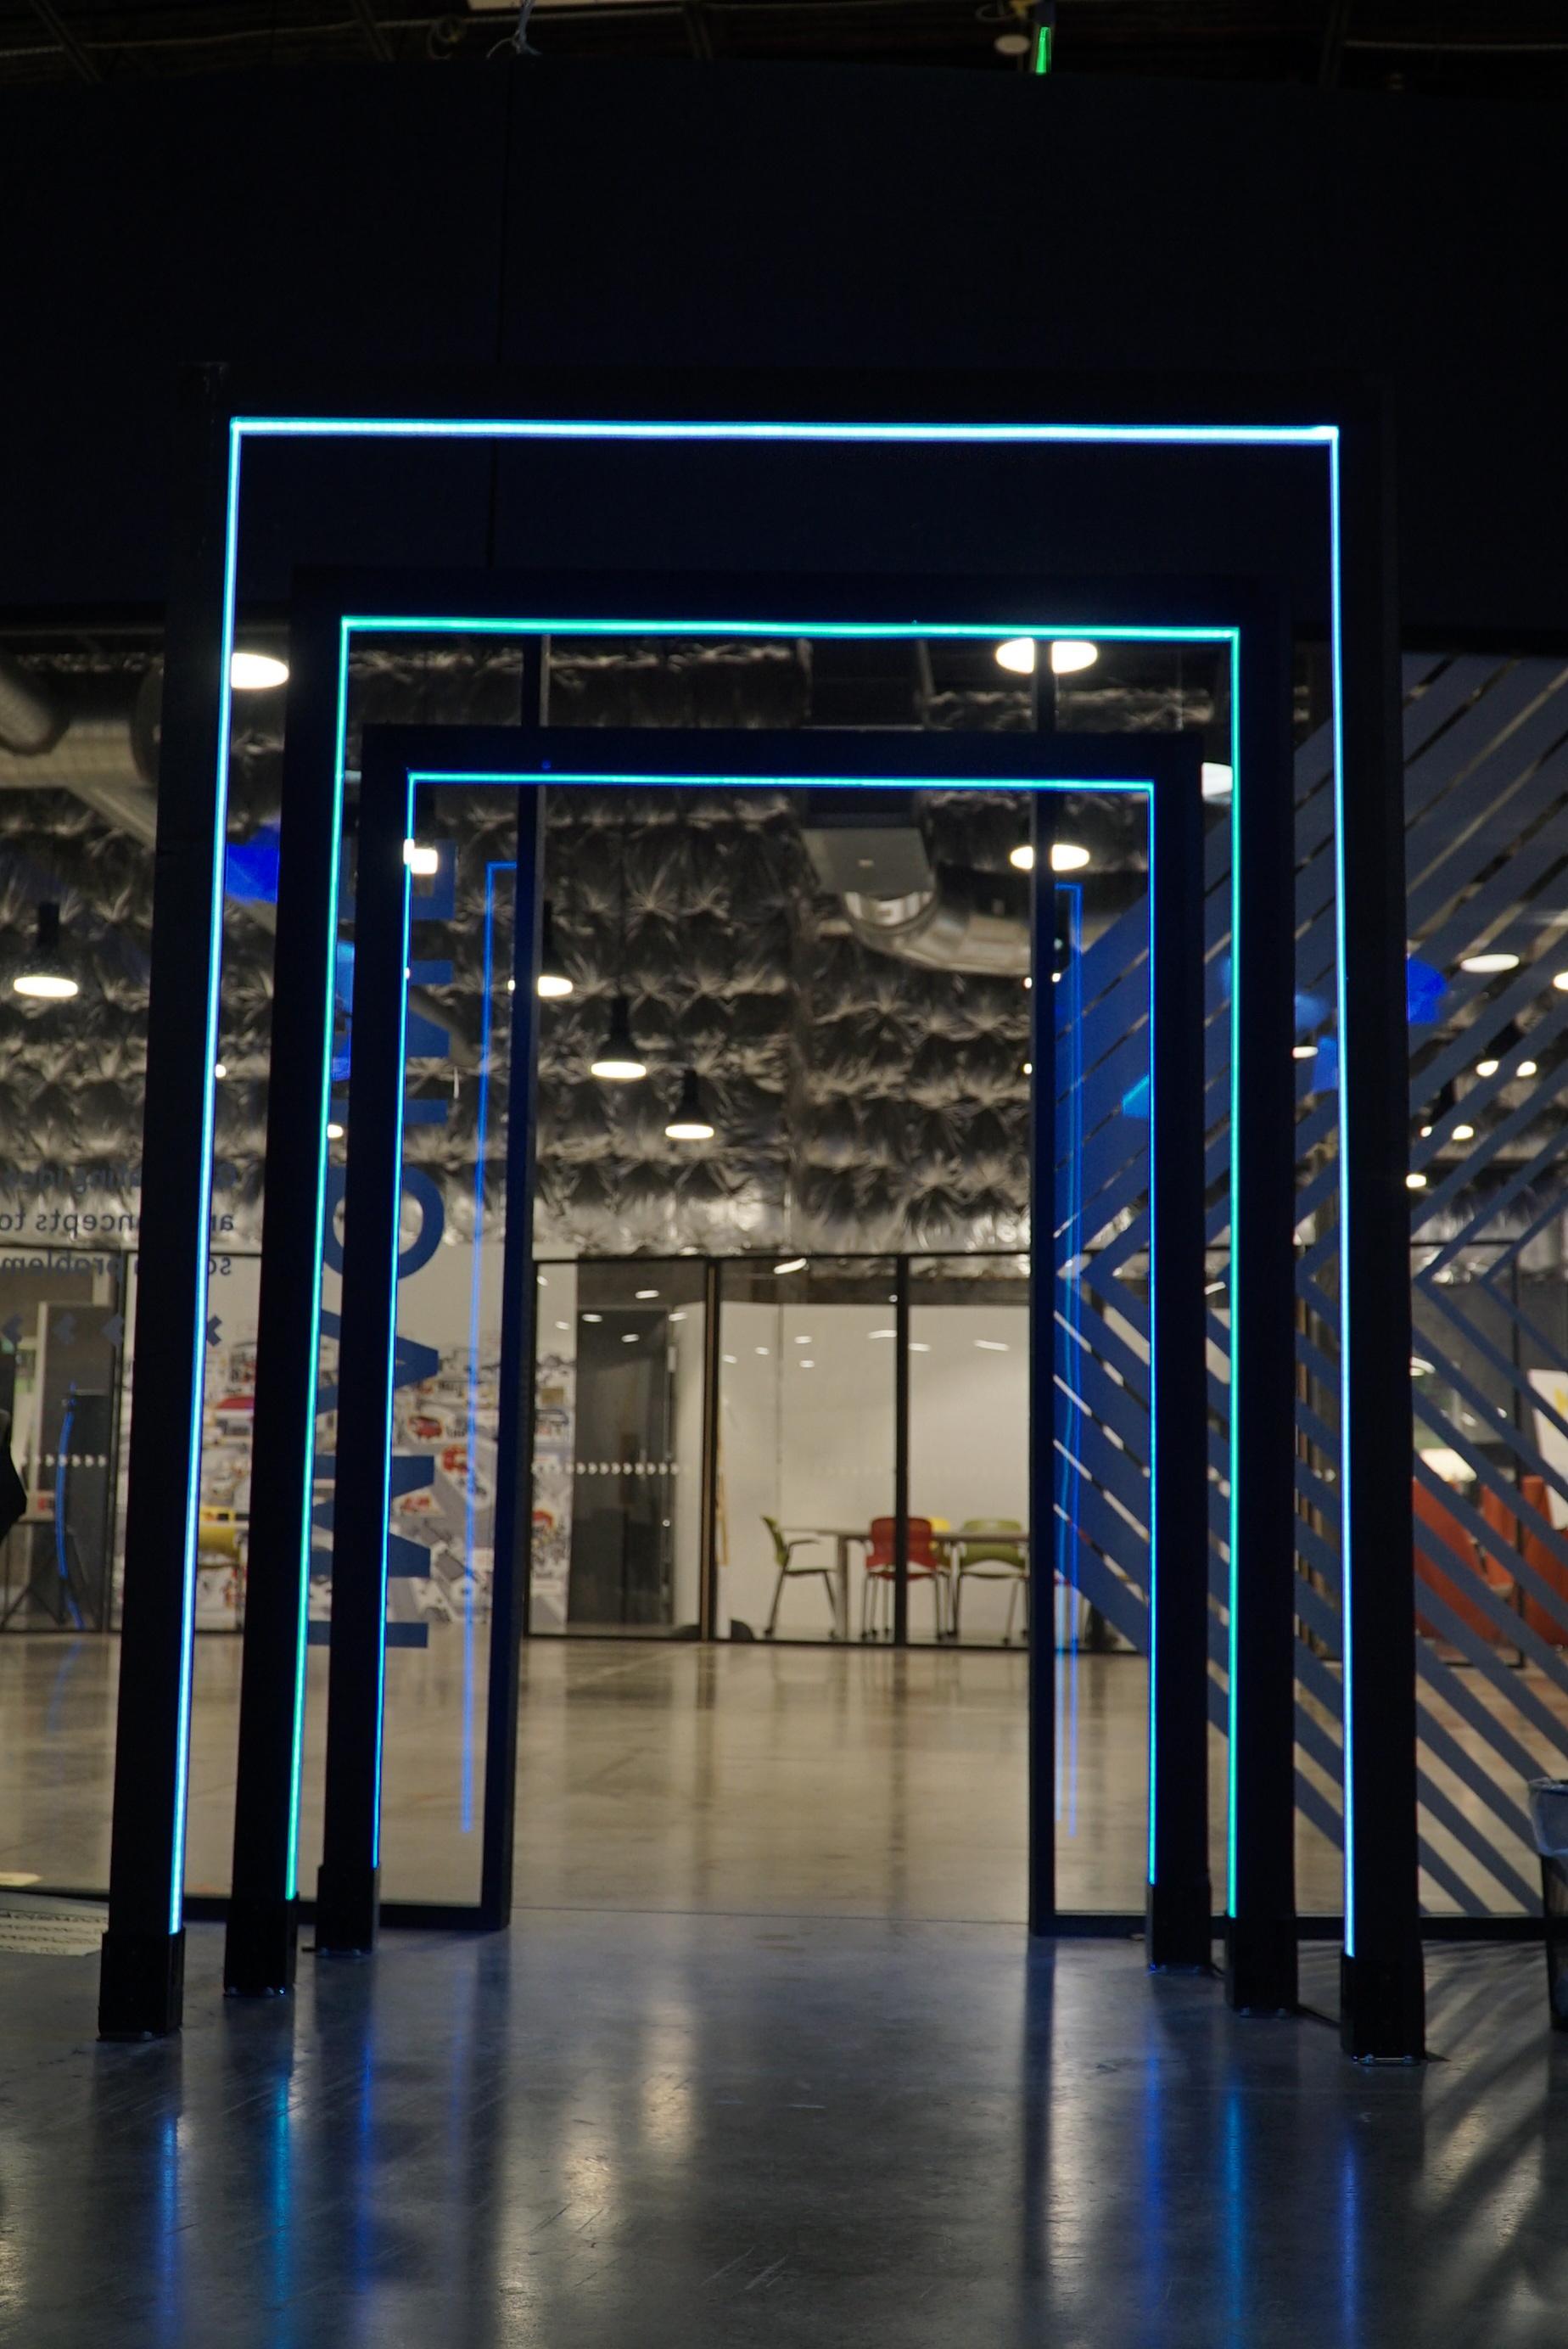 LED lit Archway